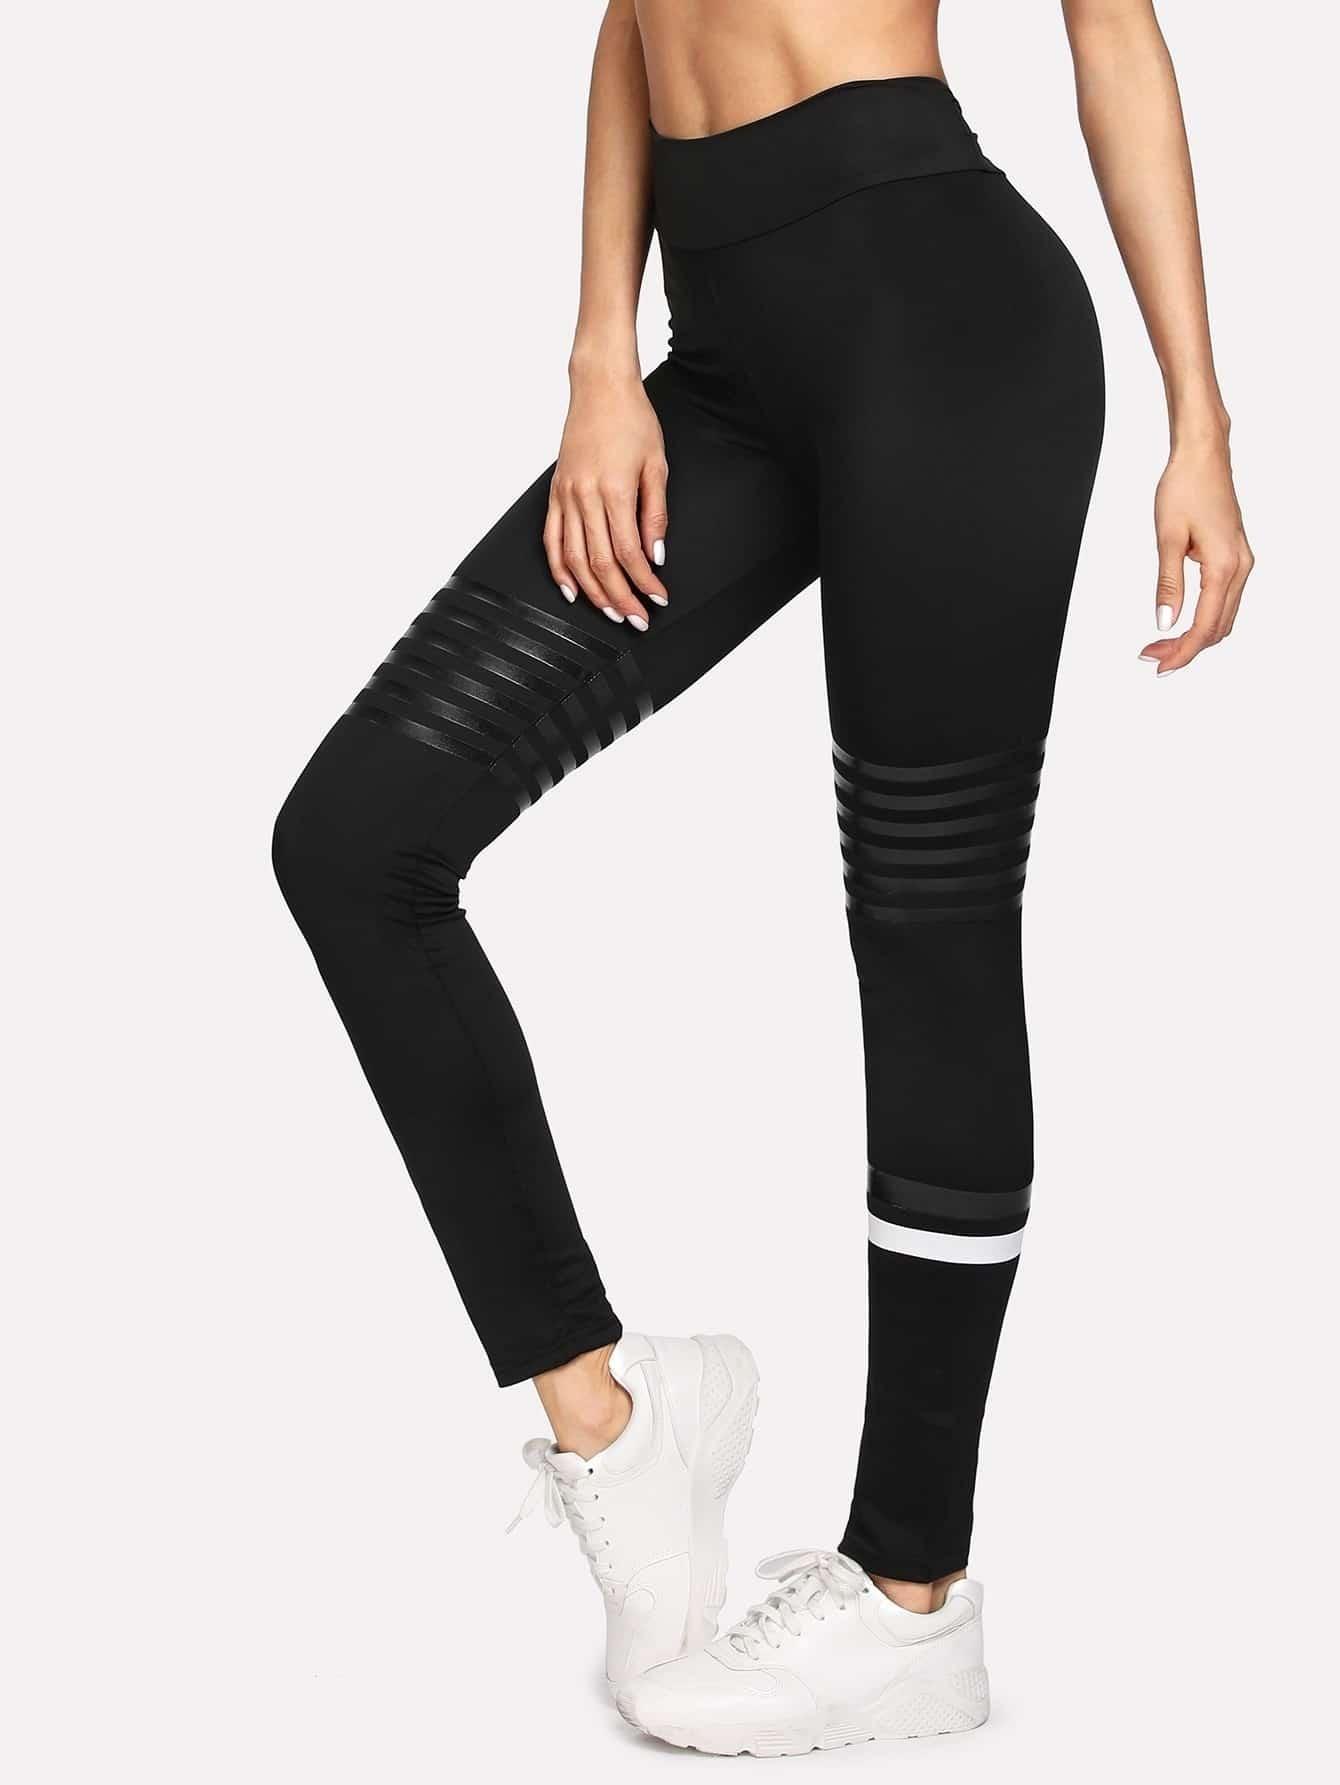 Striped Tight Leggings asymmetric striped leggings